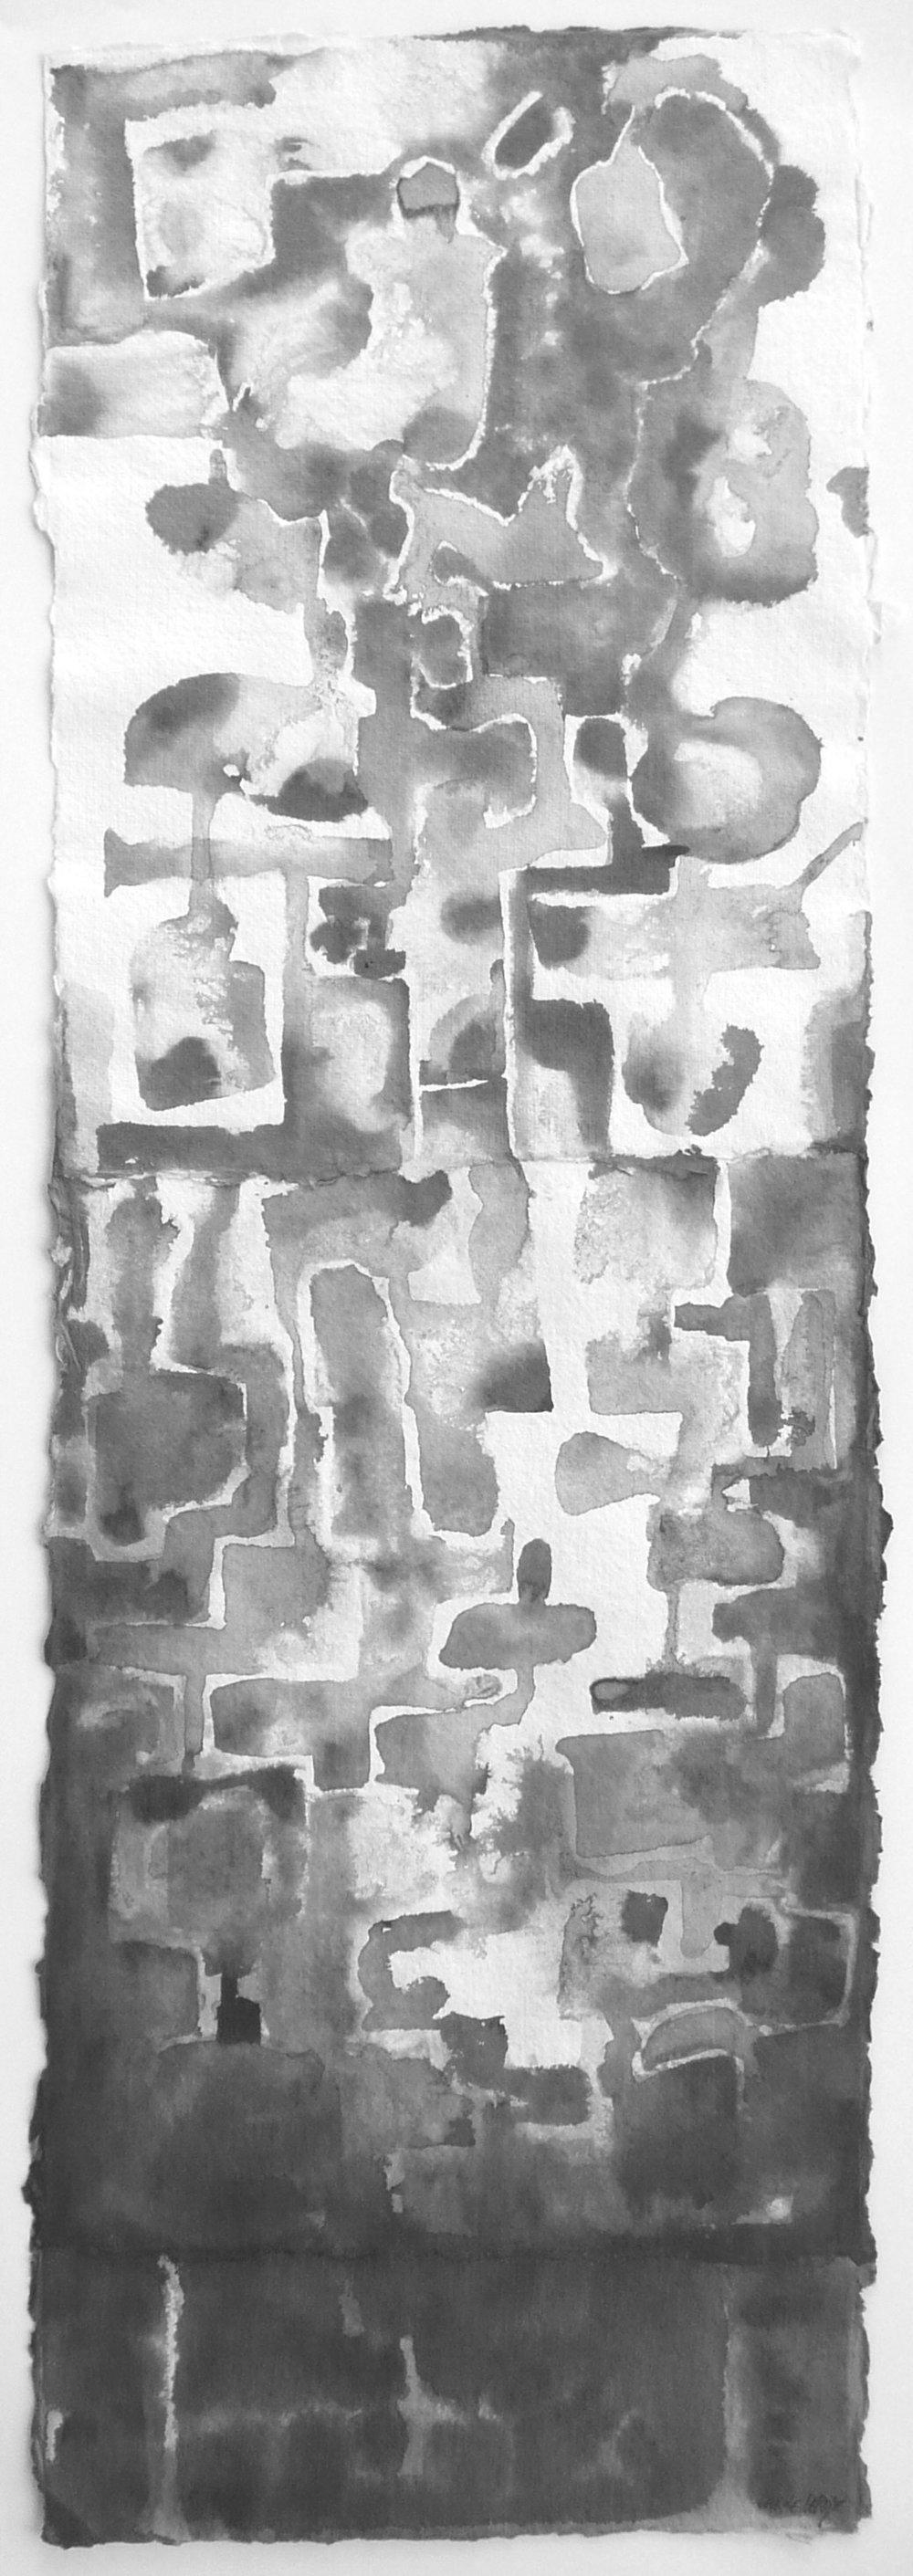 Diptyque, Encres, collage, 32 x 93 cm